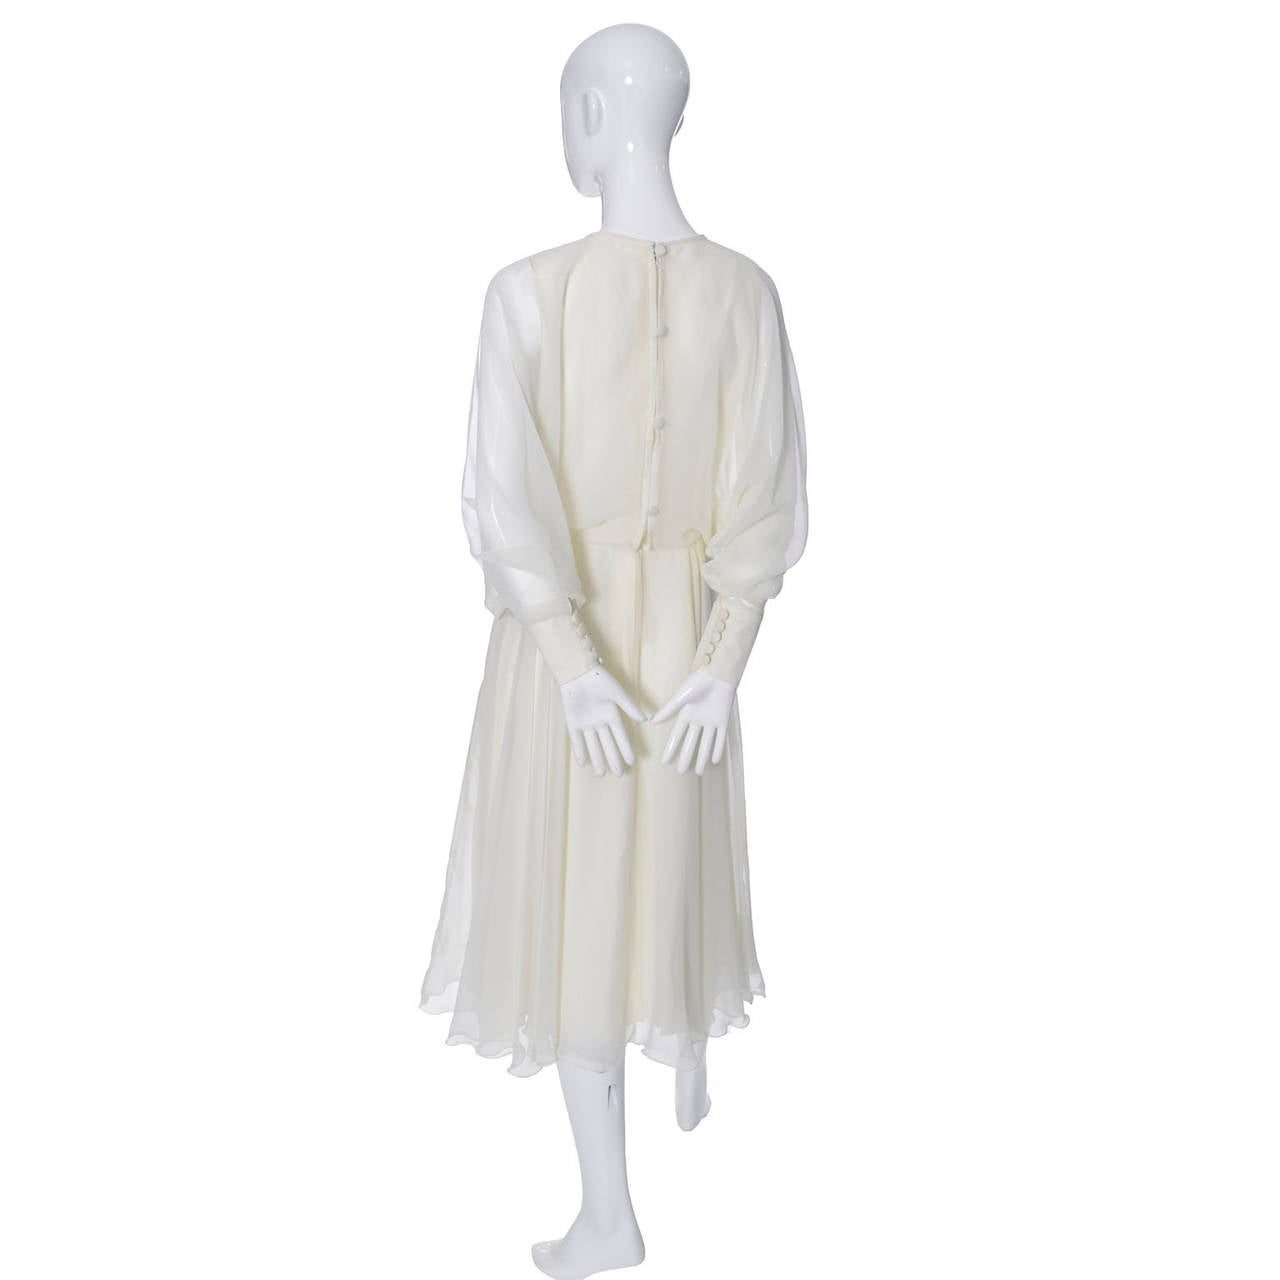 Gray 1970s Vintage Jean Varon John Bates Chiffon Designer Dress Batwing Sleeves For Sale